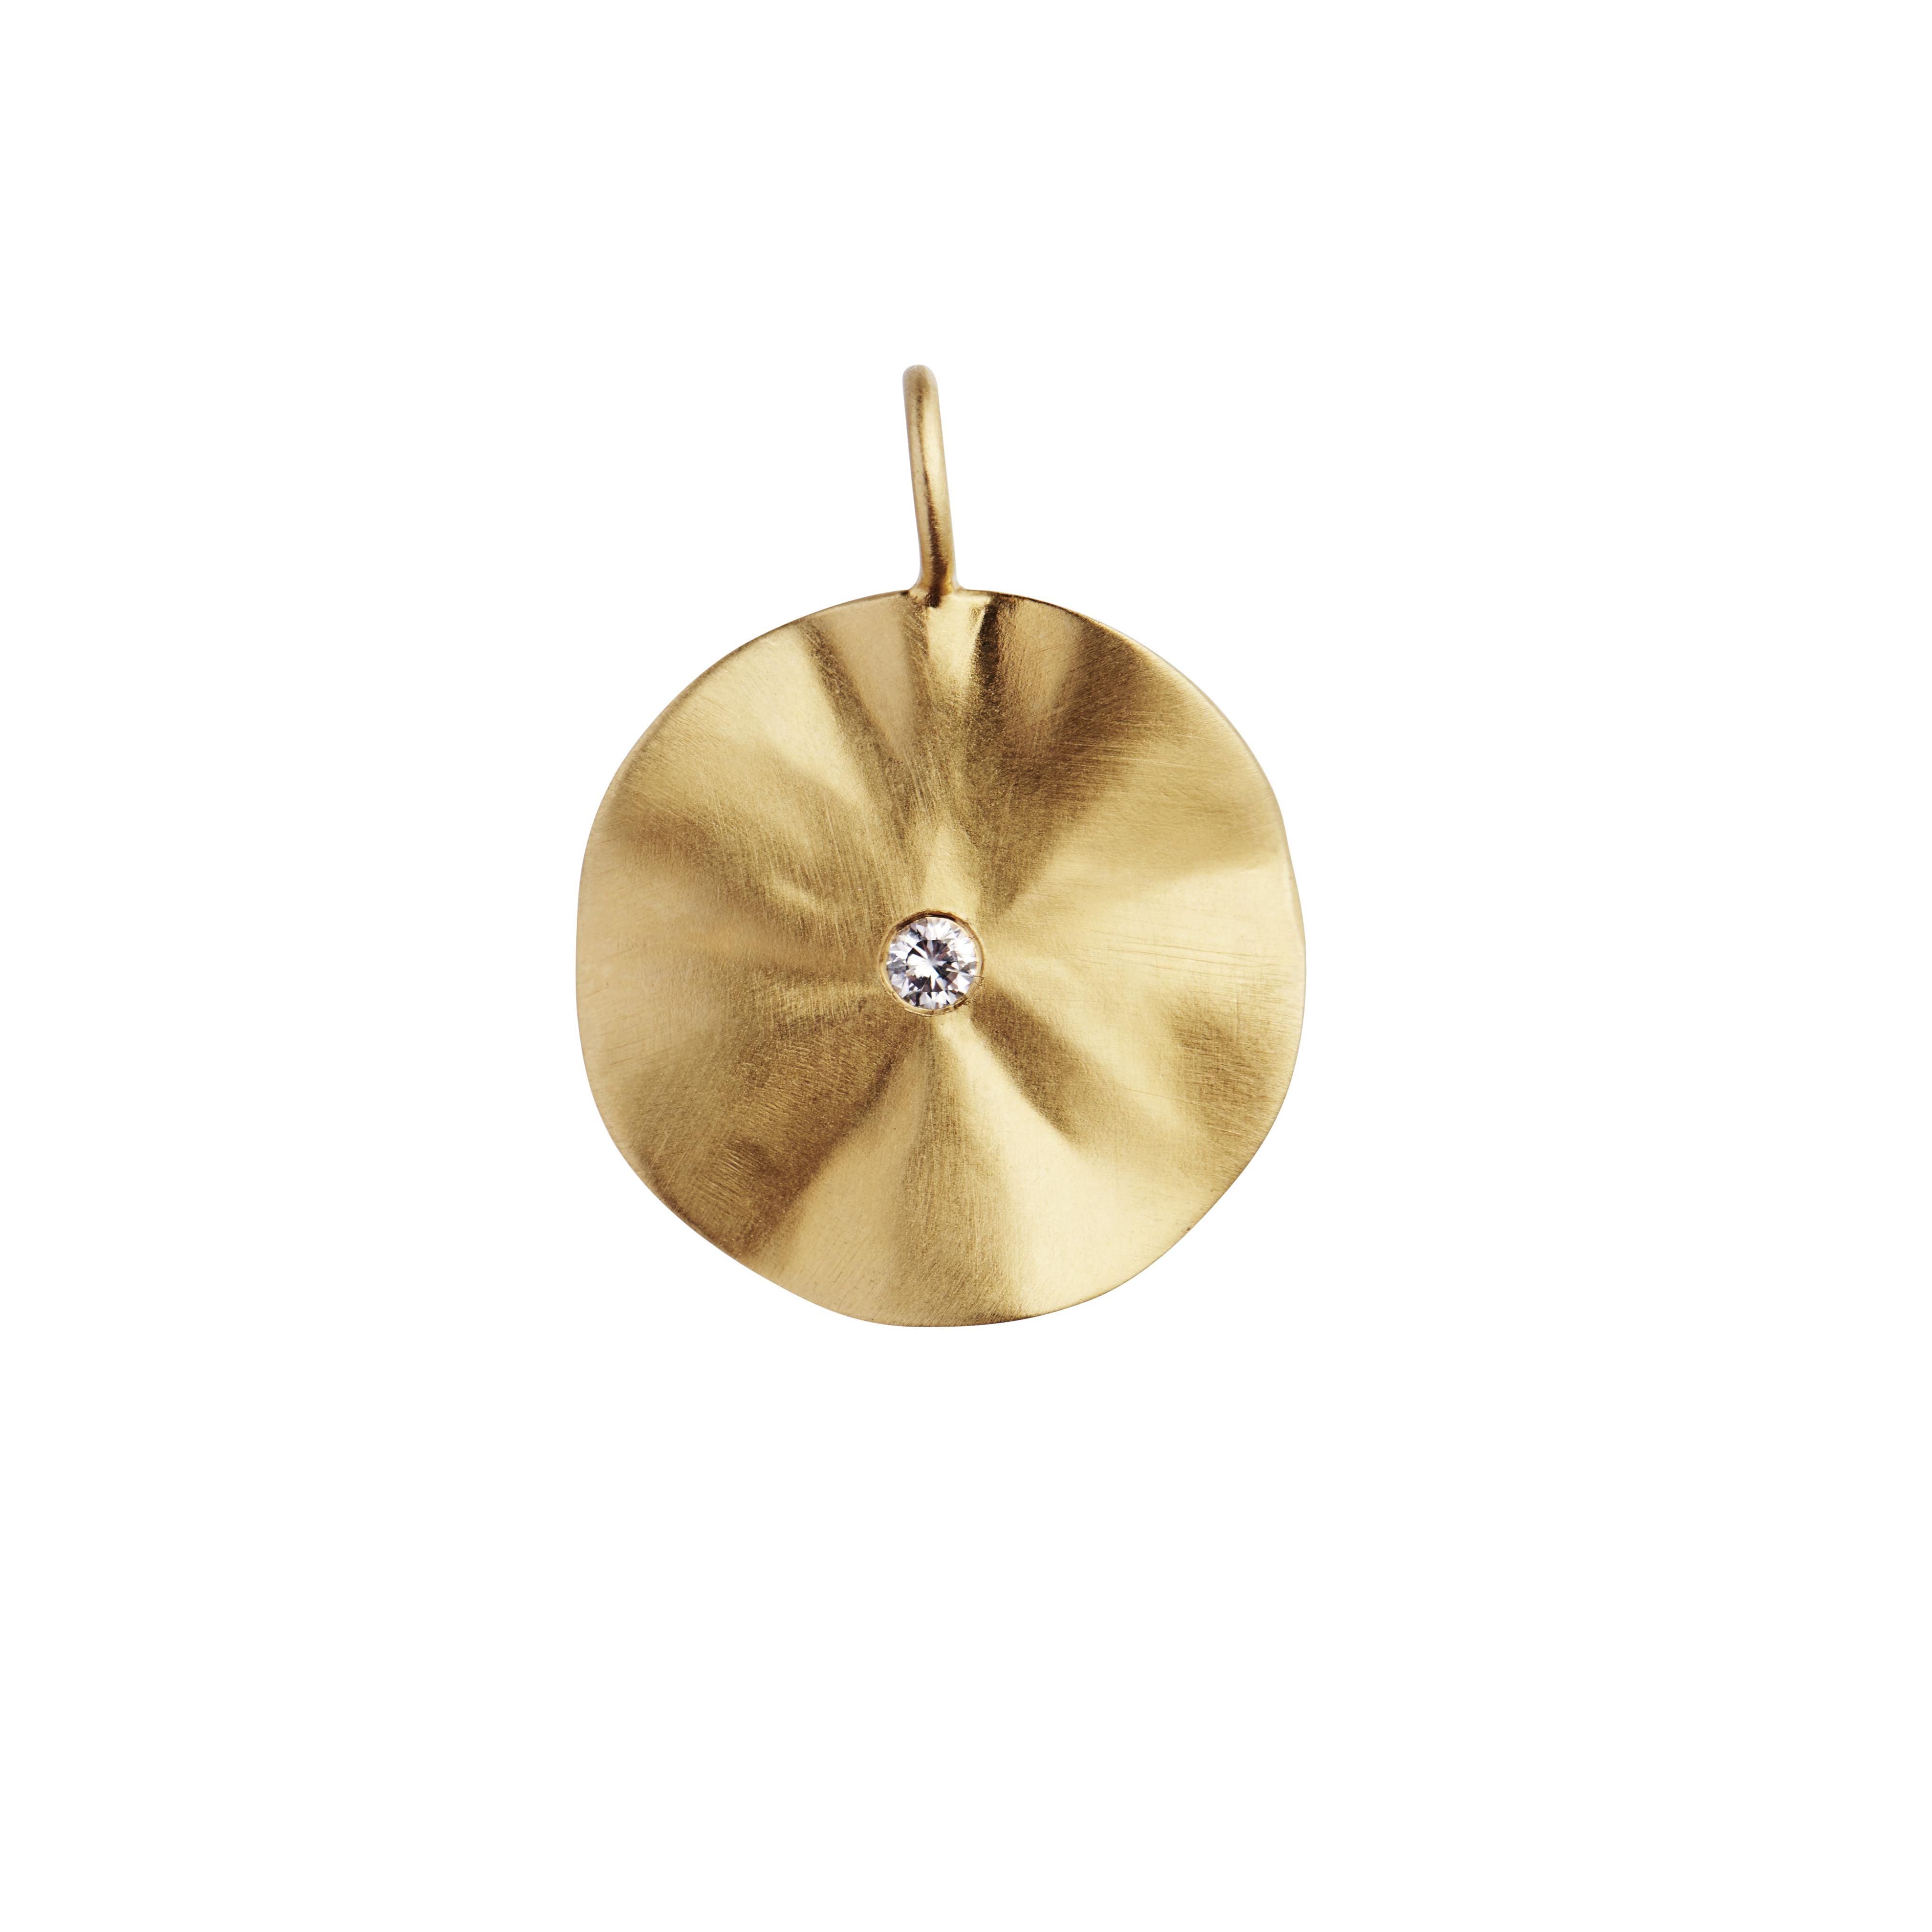 Stine A La Feuille vedhæng, guld